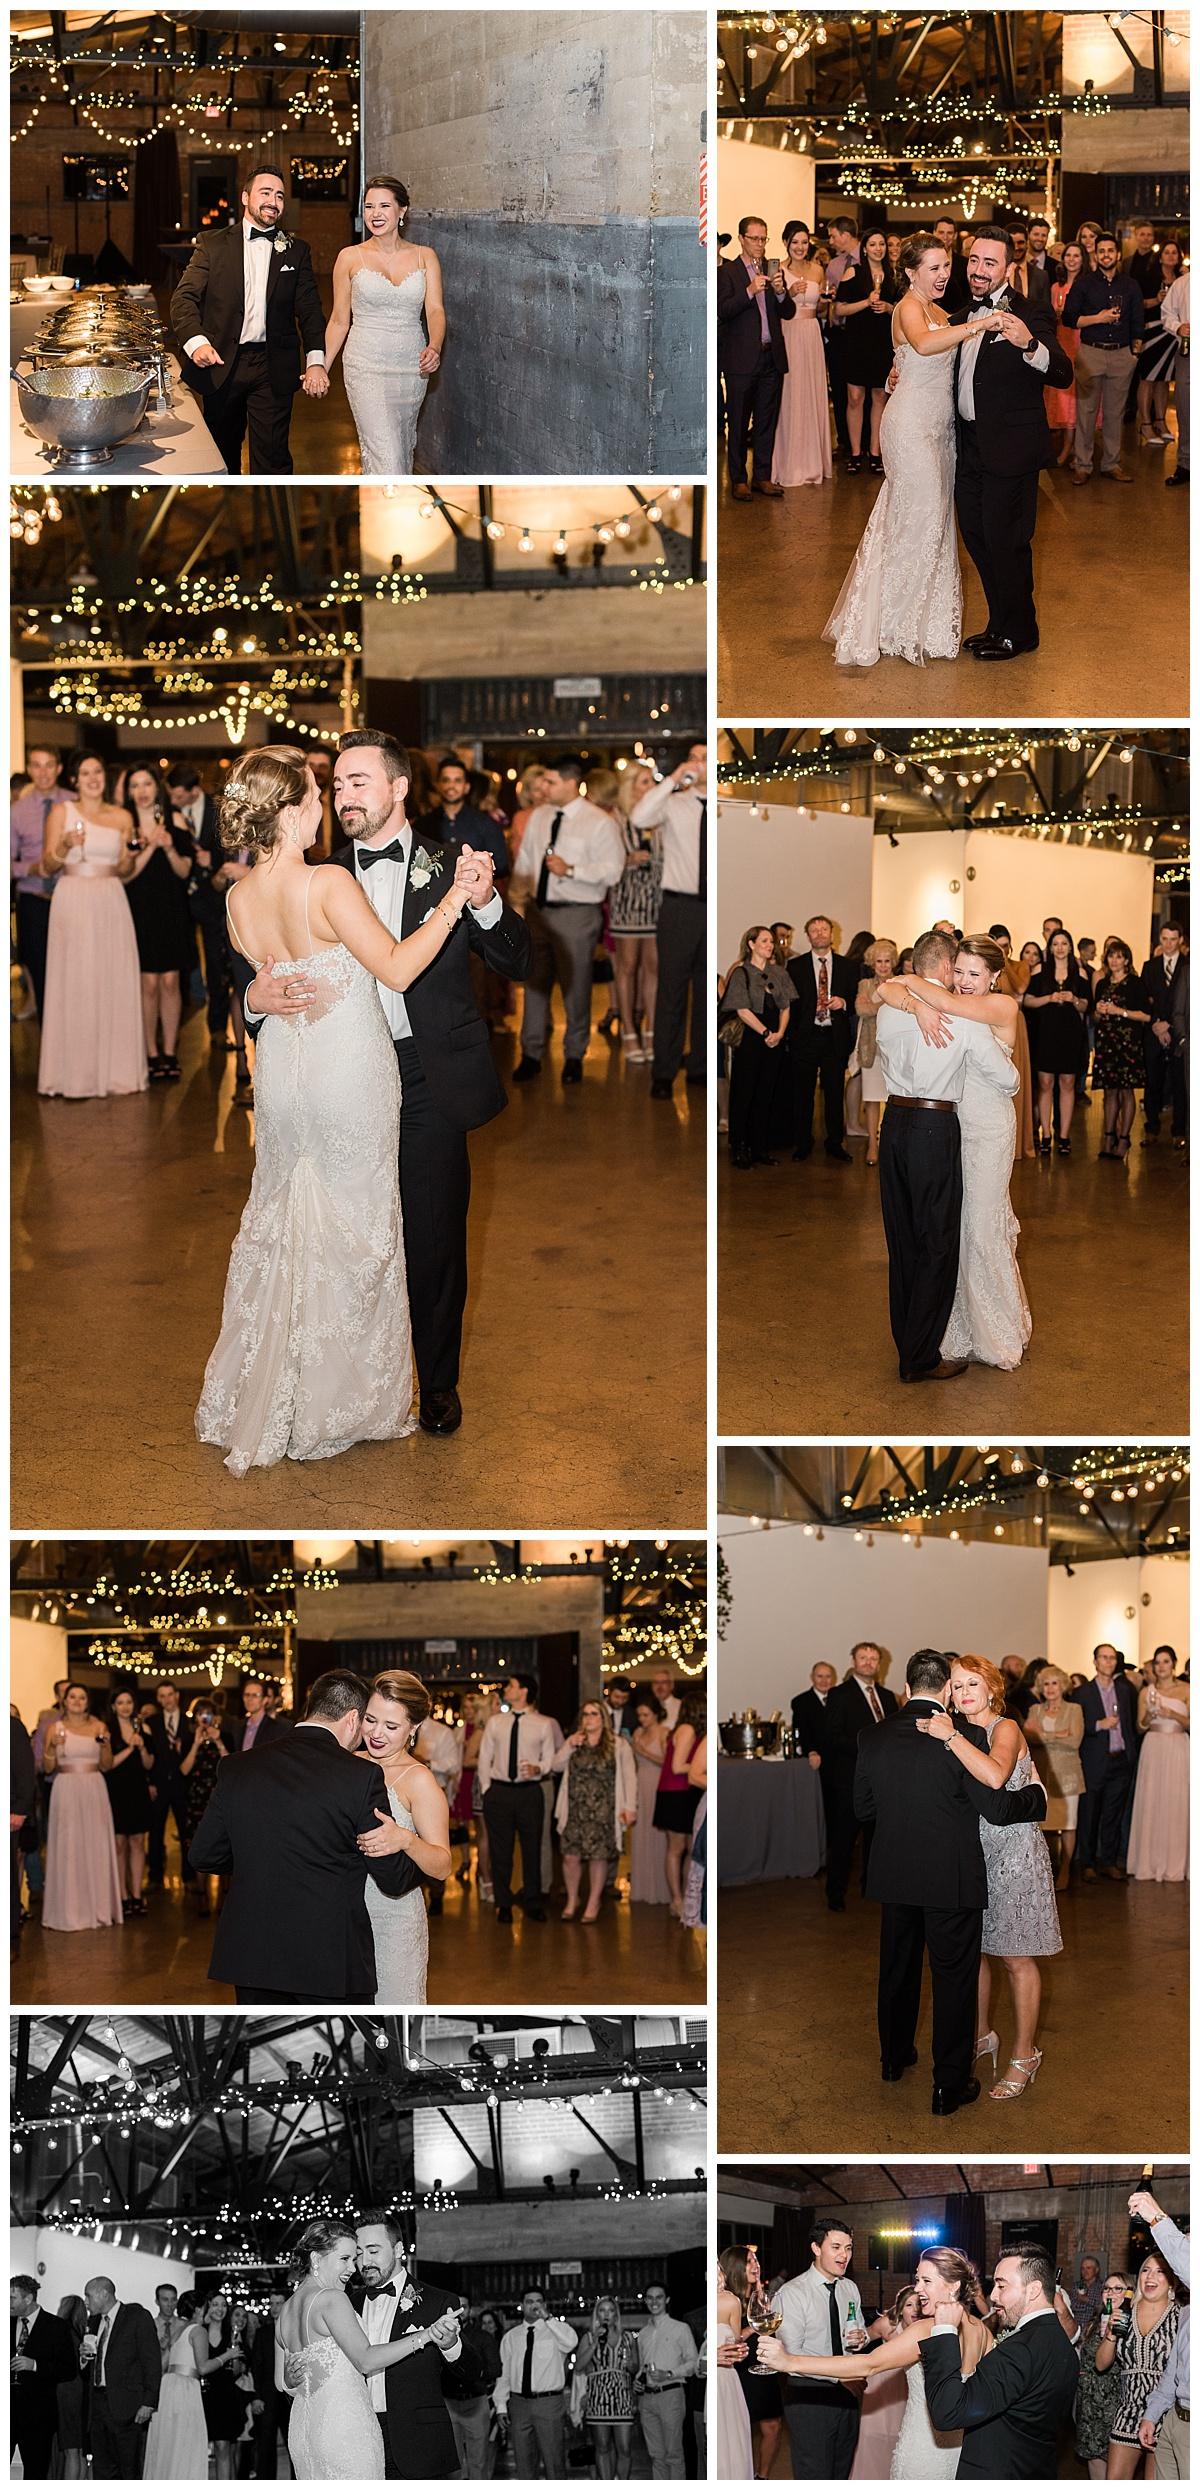 hickory-stree-annex-wedding-ar-photography-nicole-nolan-17.jpg